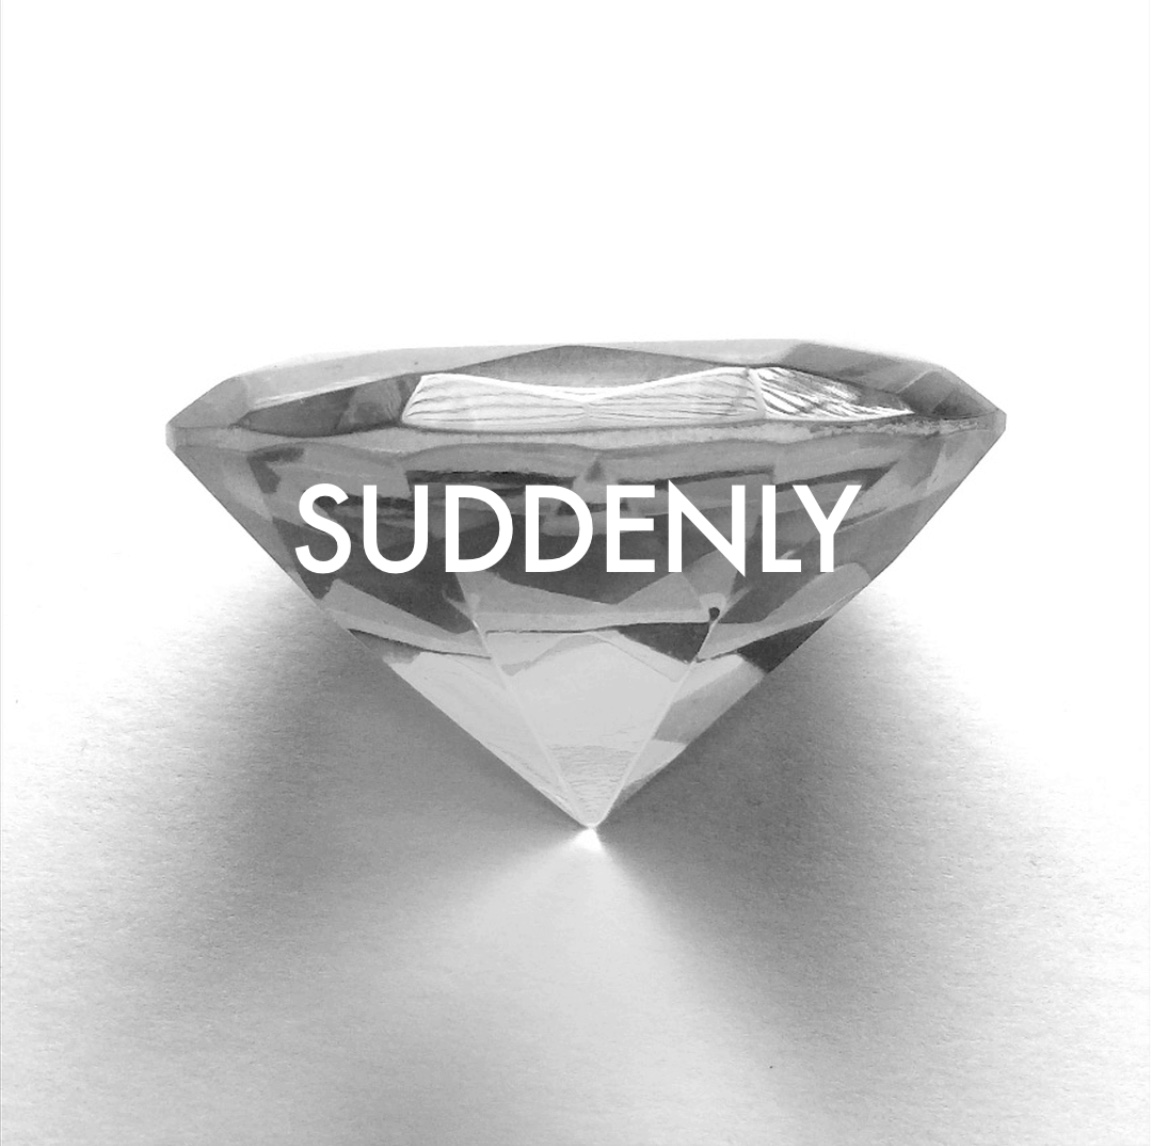 (c) Suddenlydance.ca